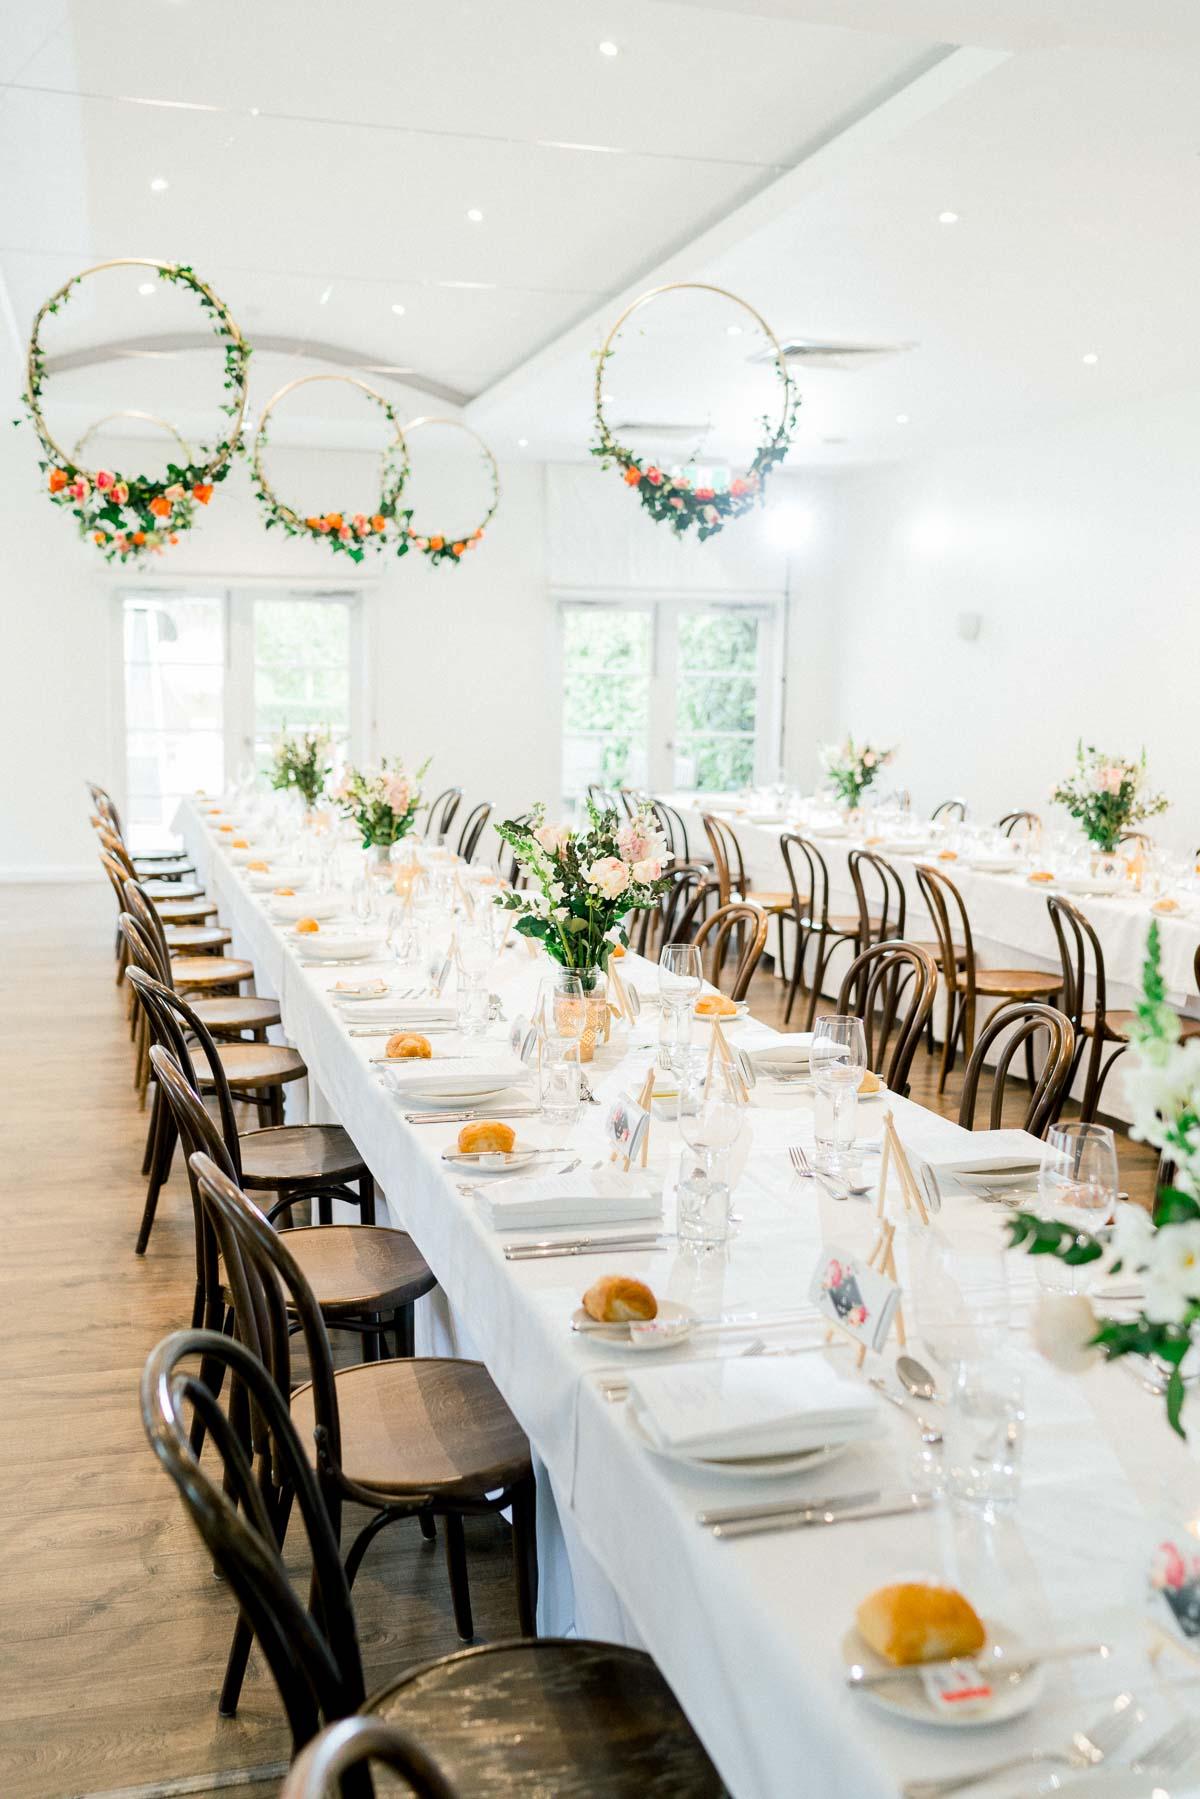 lindenderry-wedding-heart+soul-weddings-amy-alain-03843.jpg